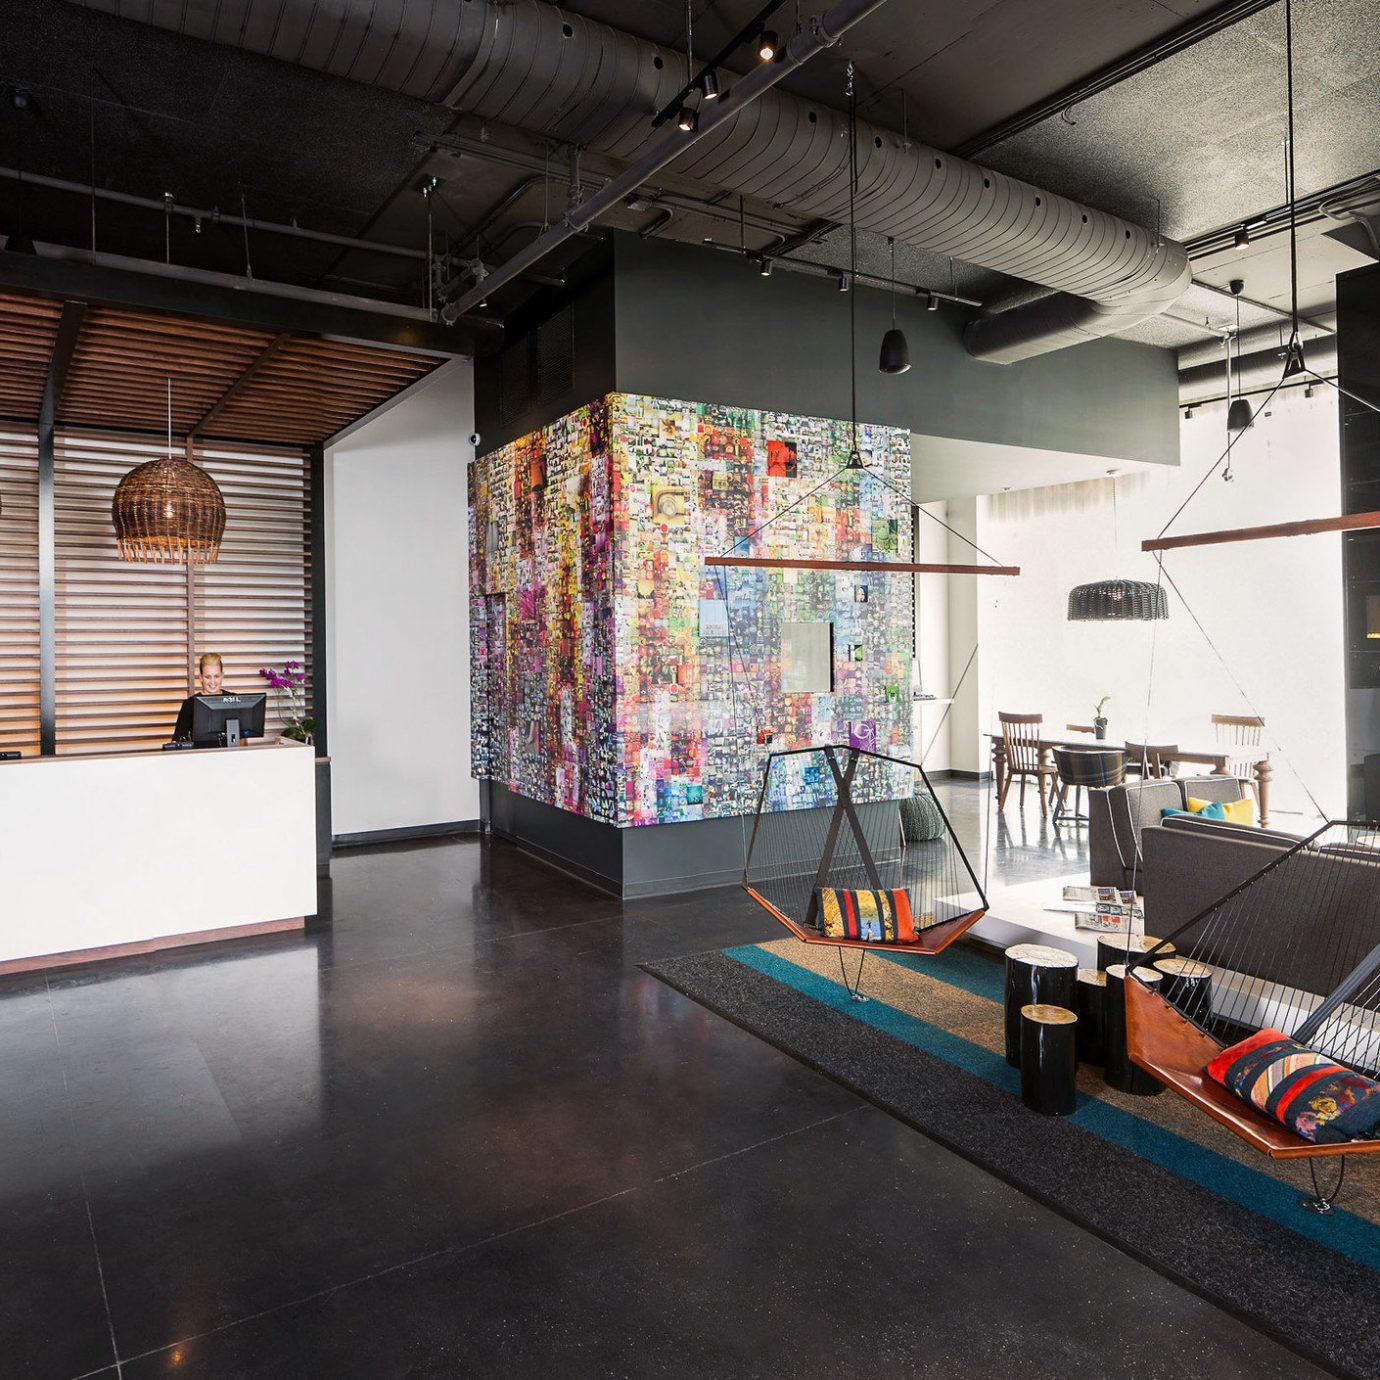 Canada Hotels Montreal Trip Ideas loft exhibition building